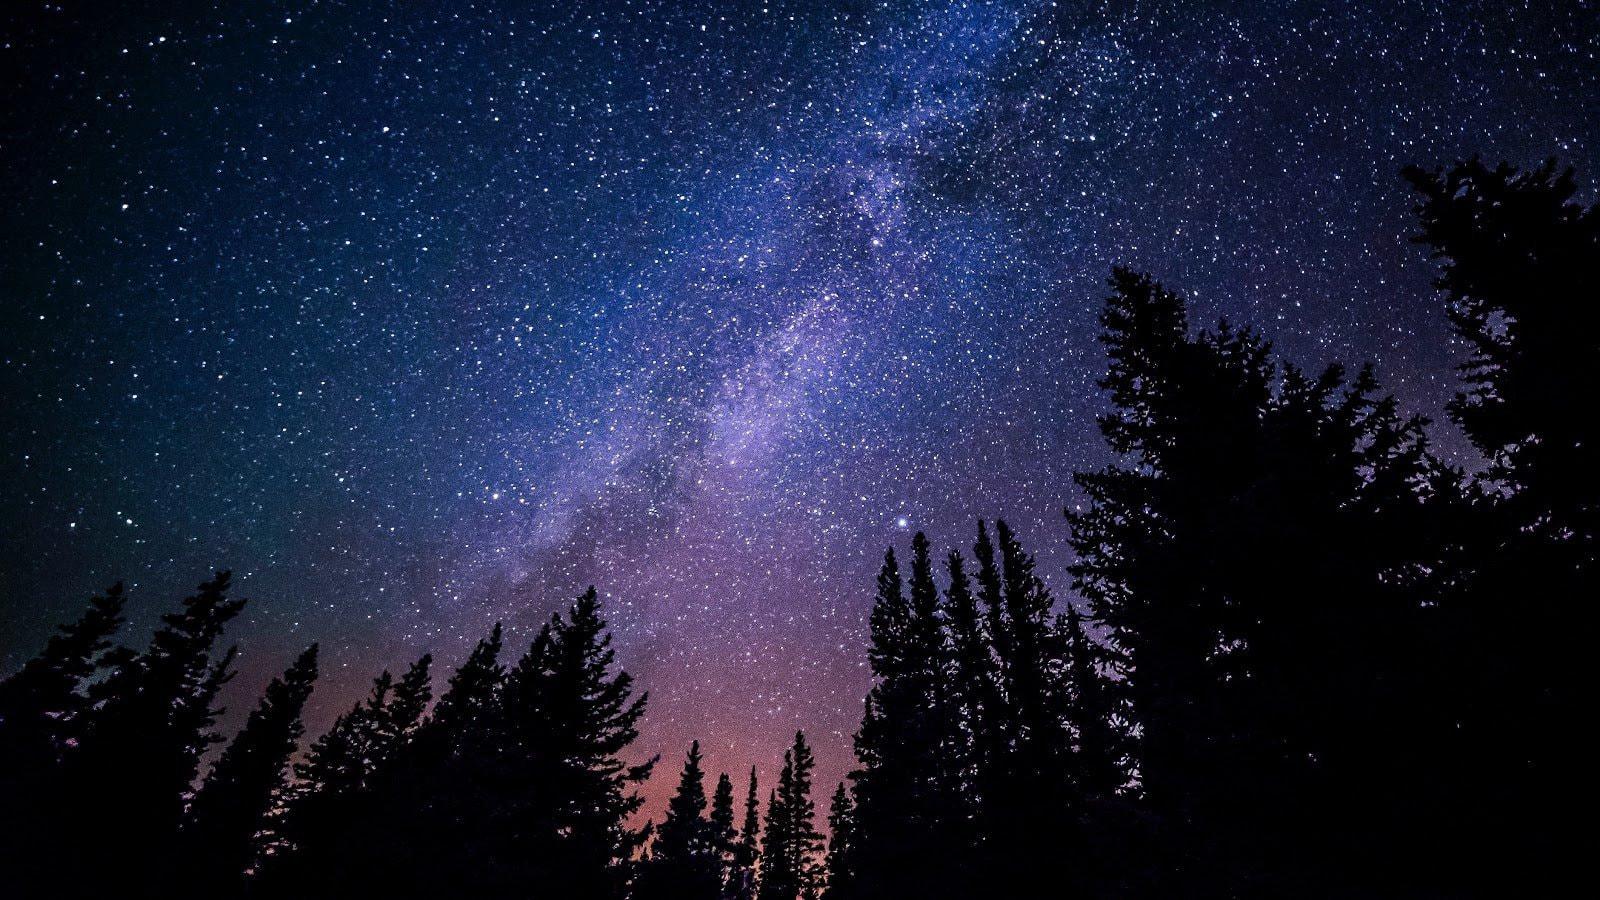 Night forest stars